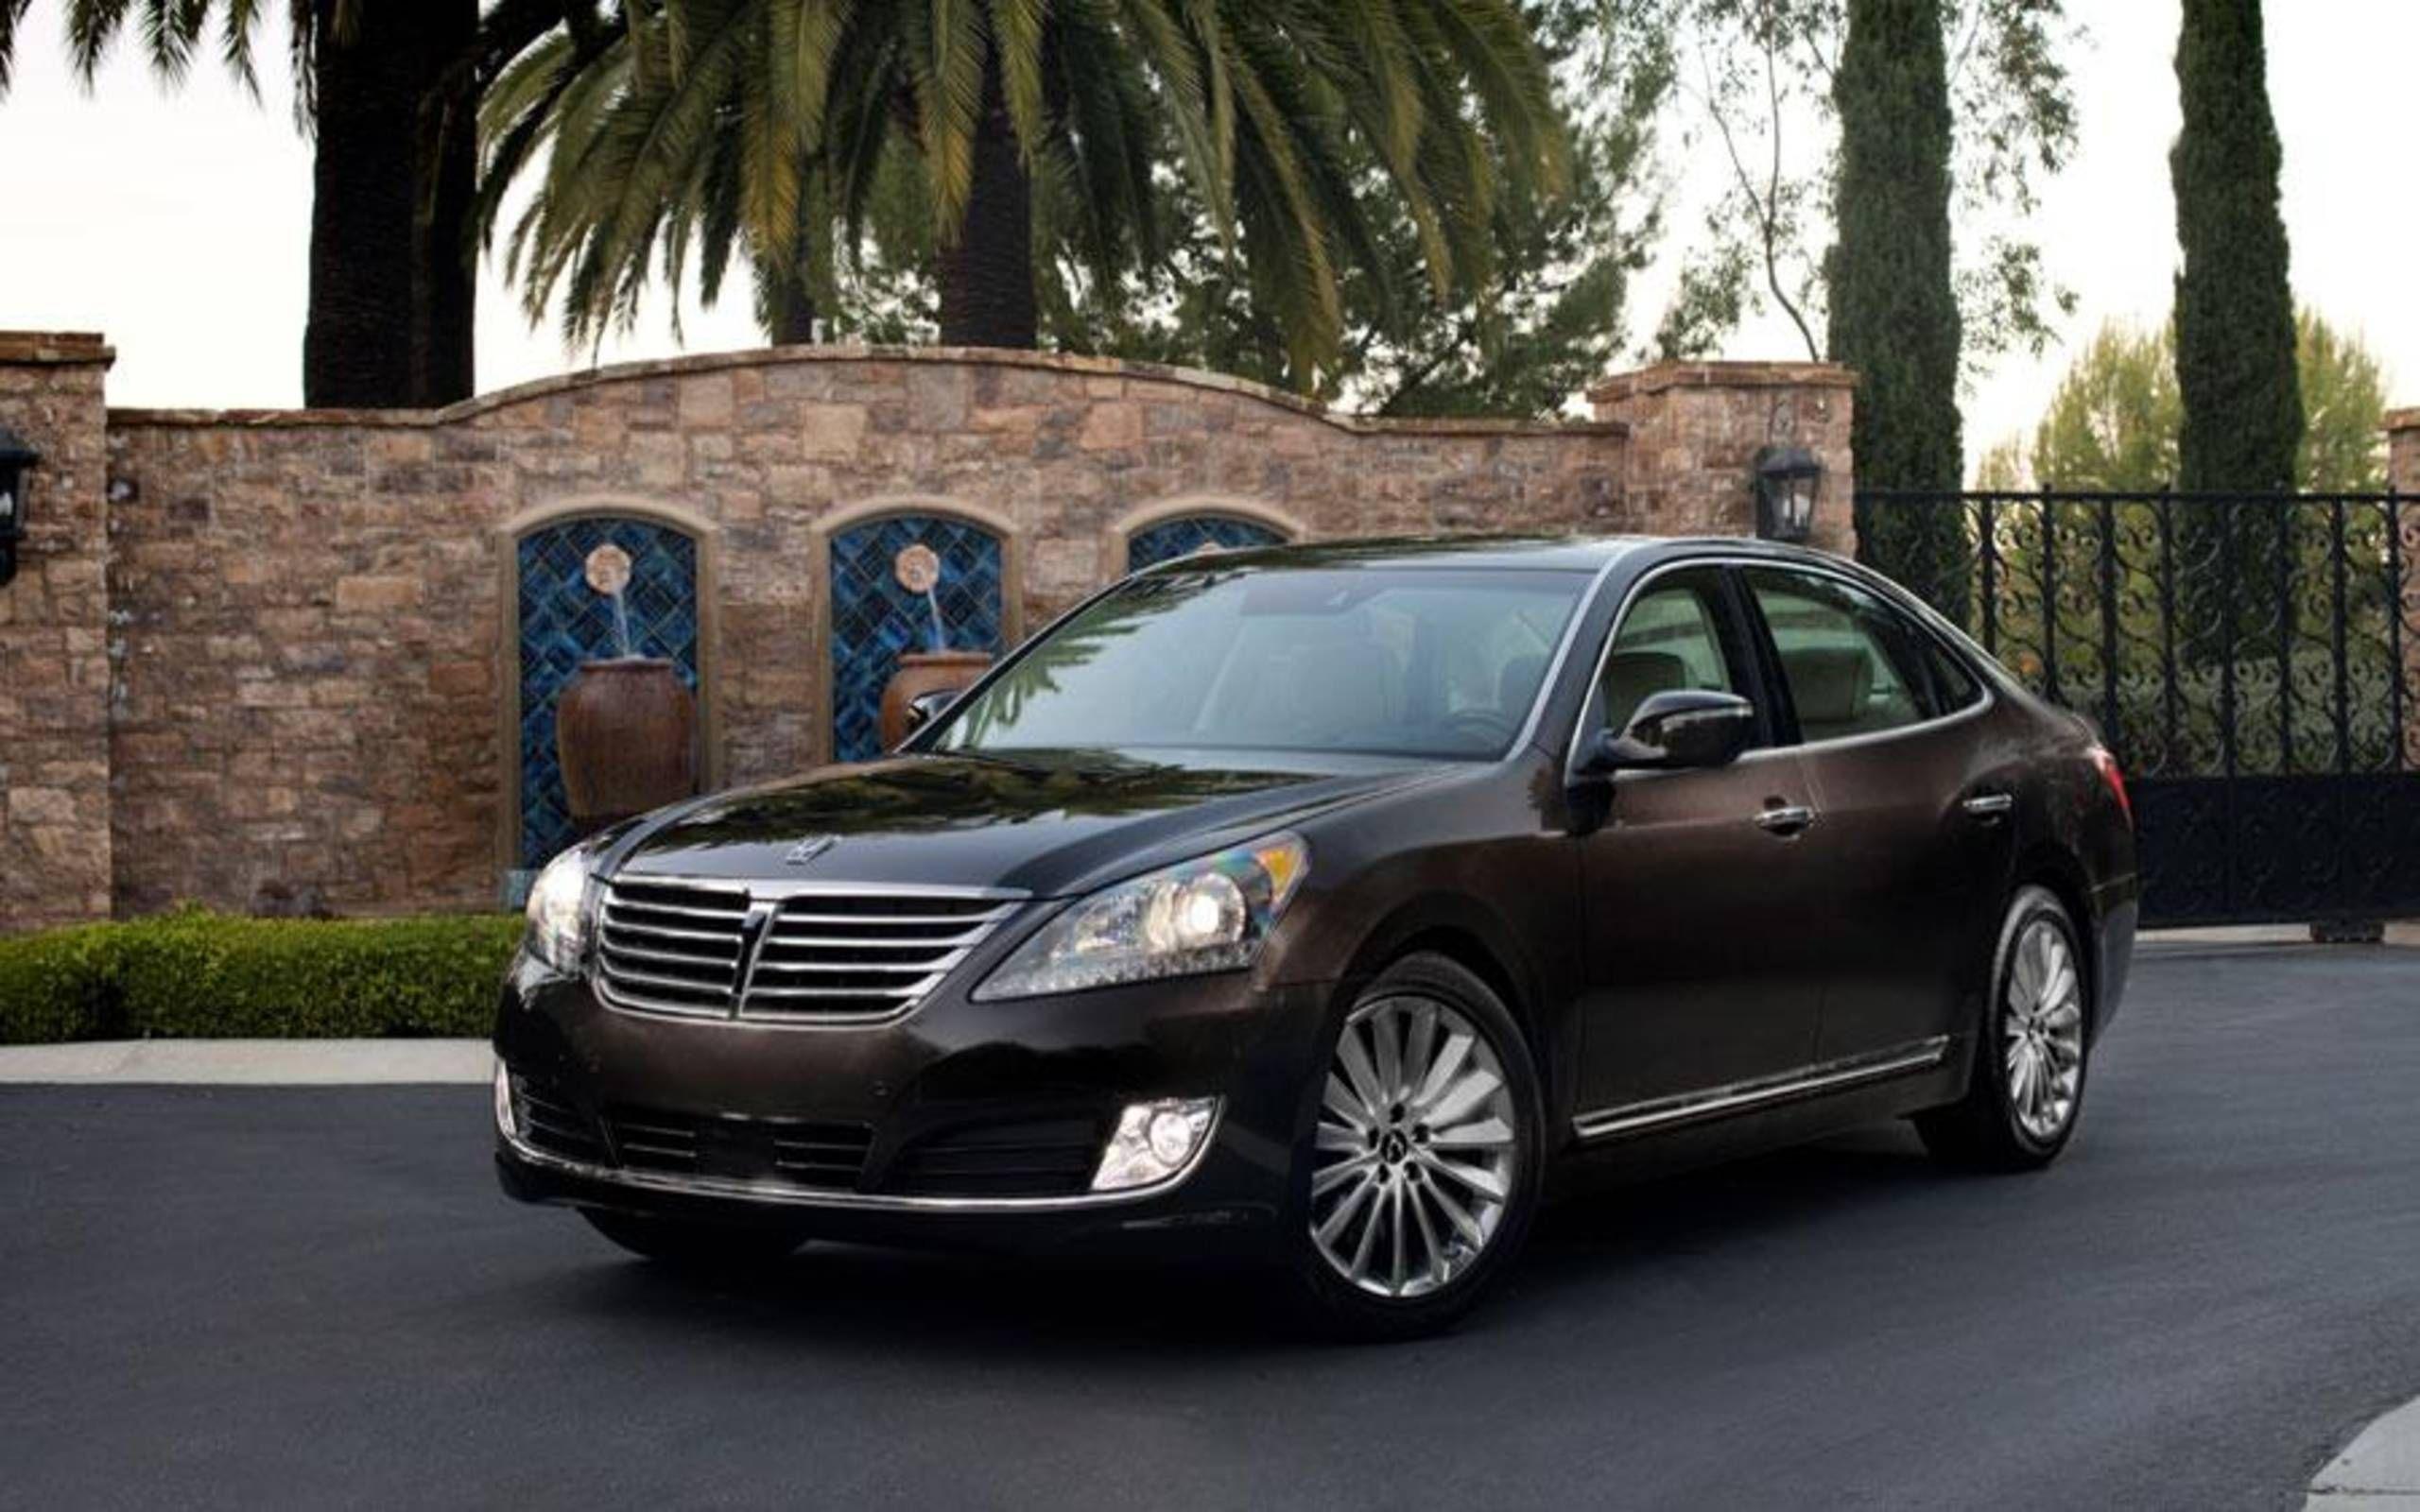 5 Hyundai Equus Ultimate review notes